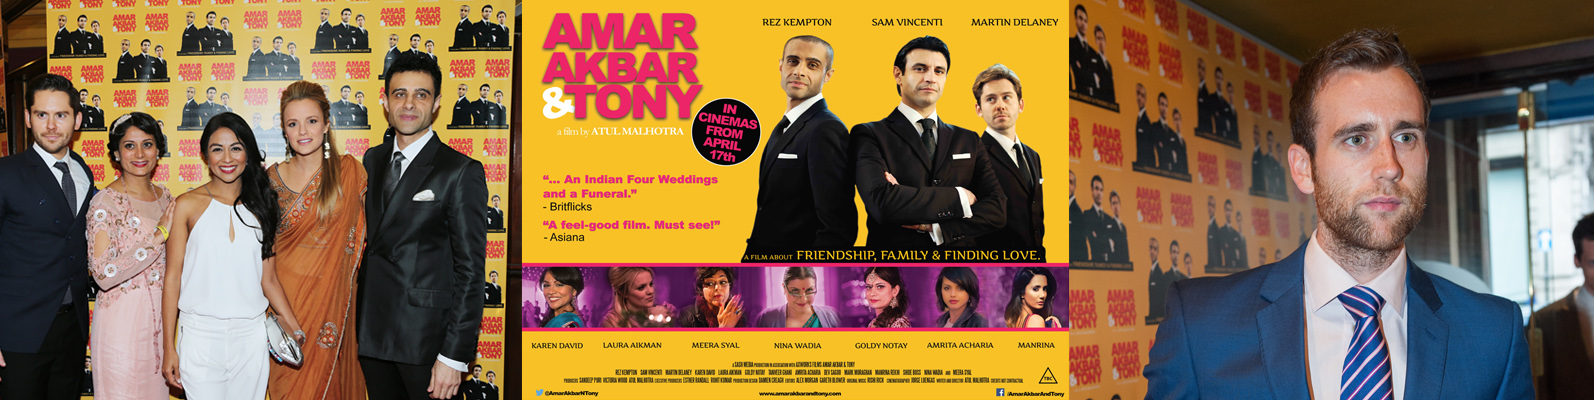 Amar Akbar & Tony Premiere